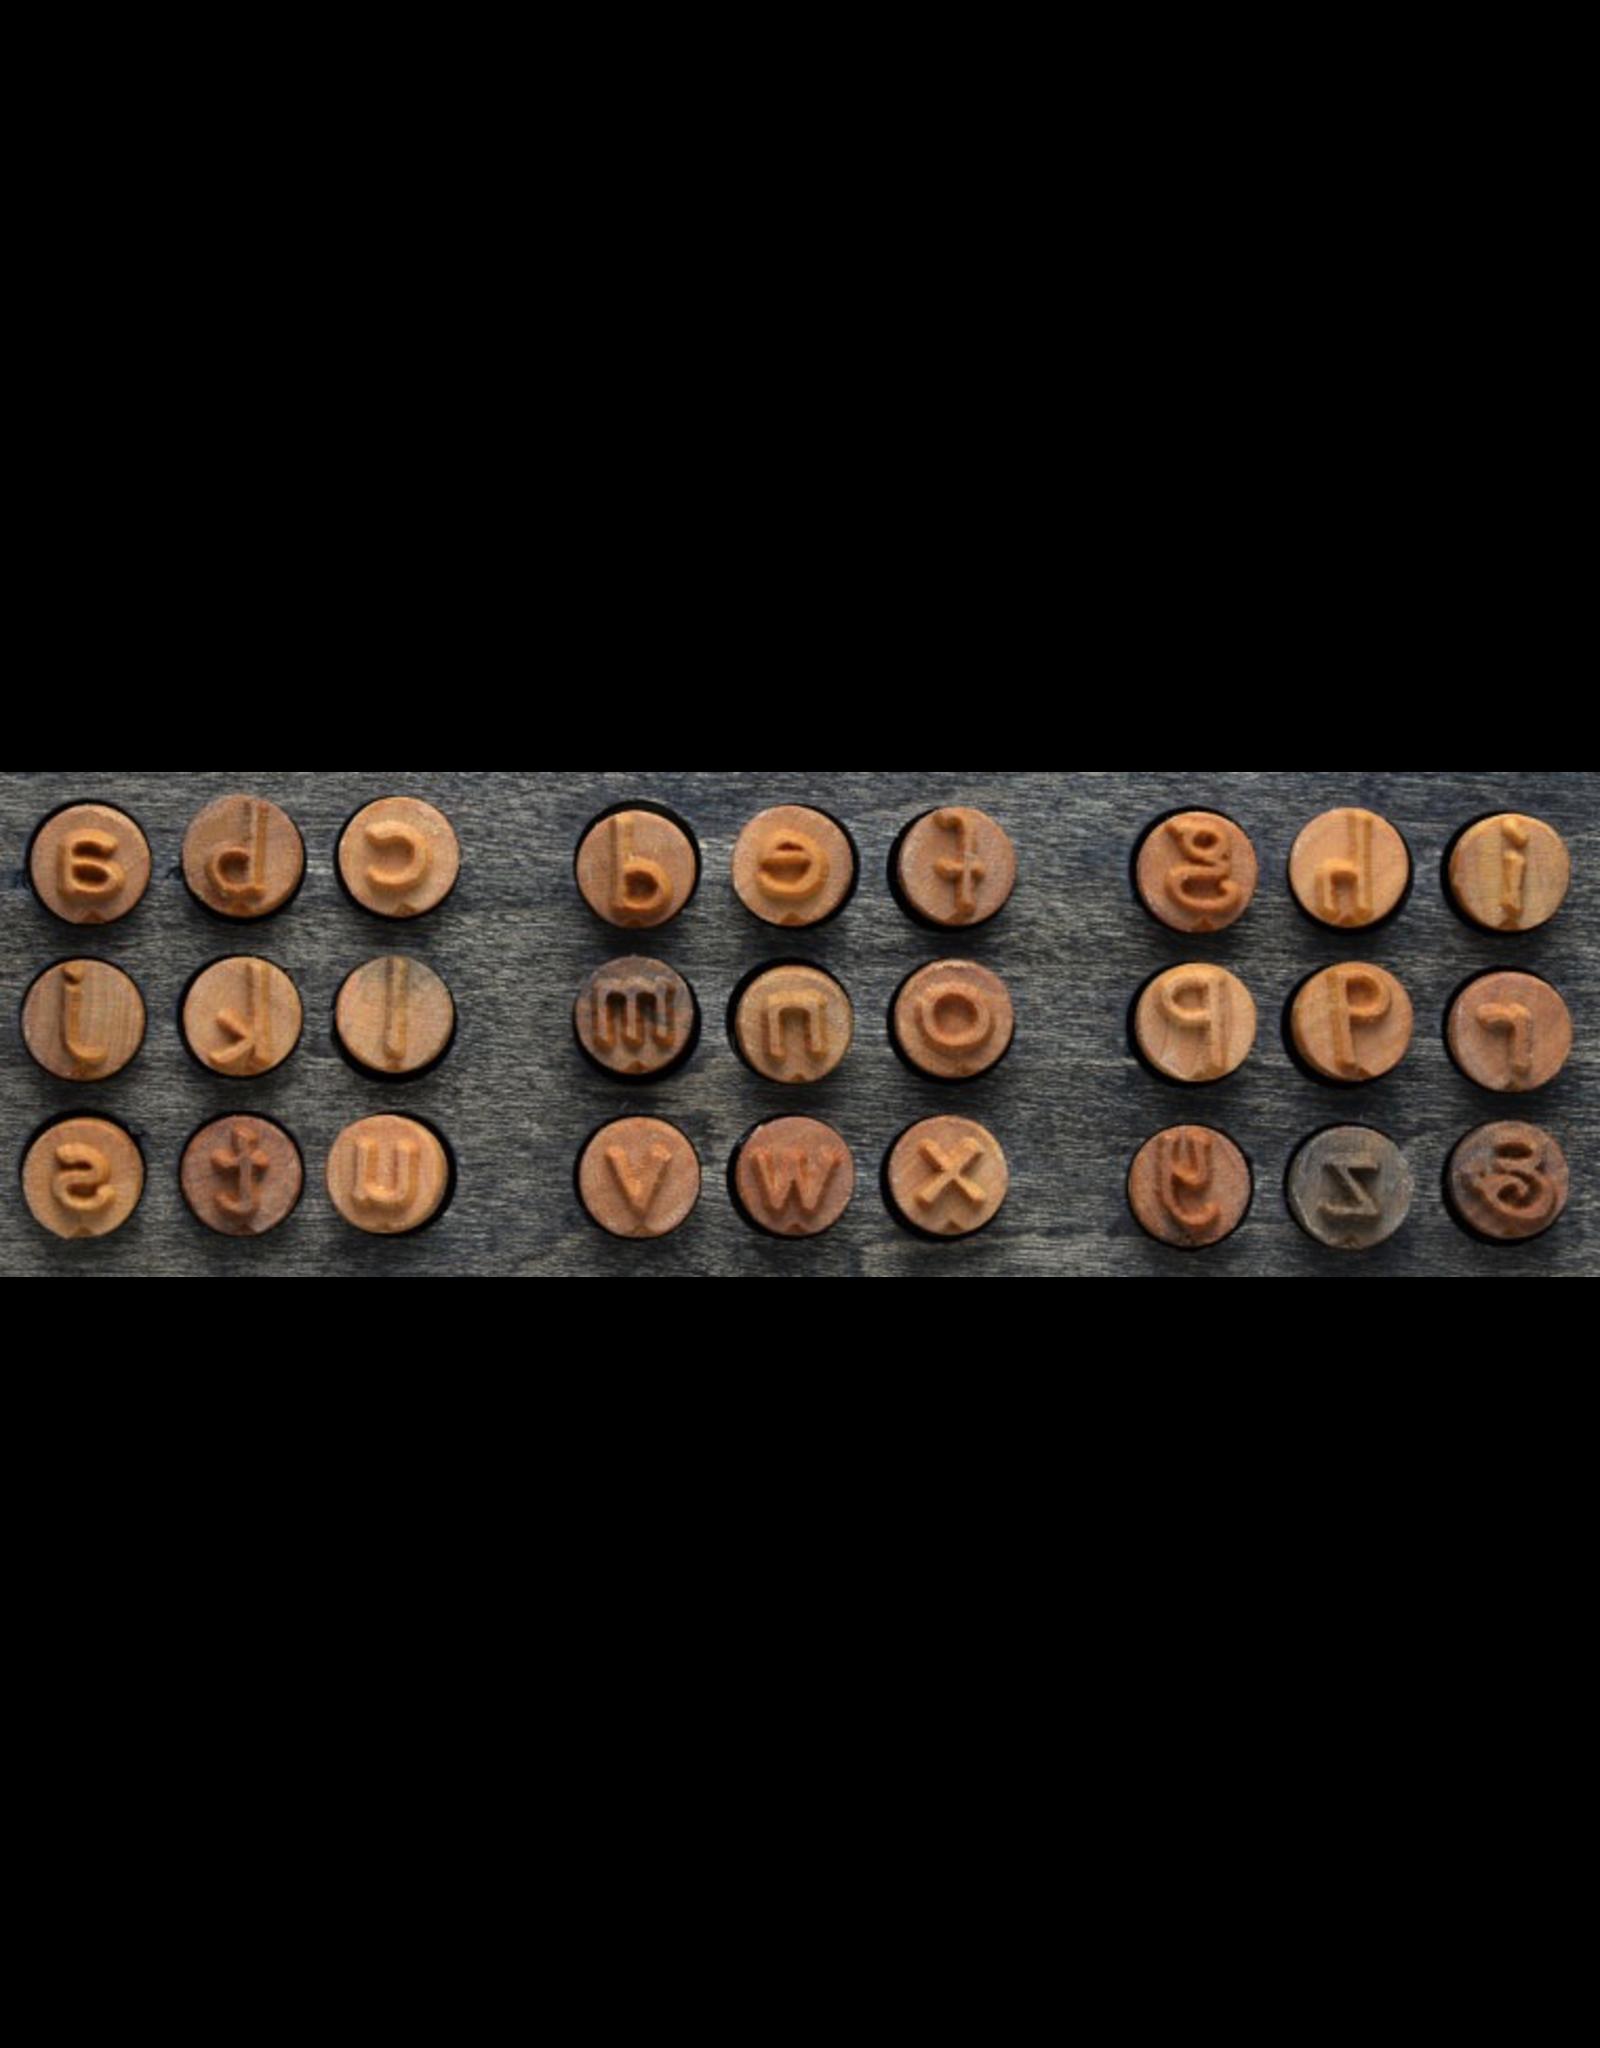 MKM tools Prints charming lowercase Font set